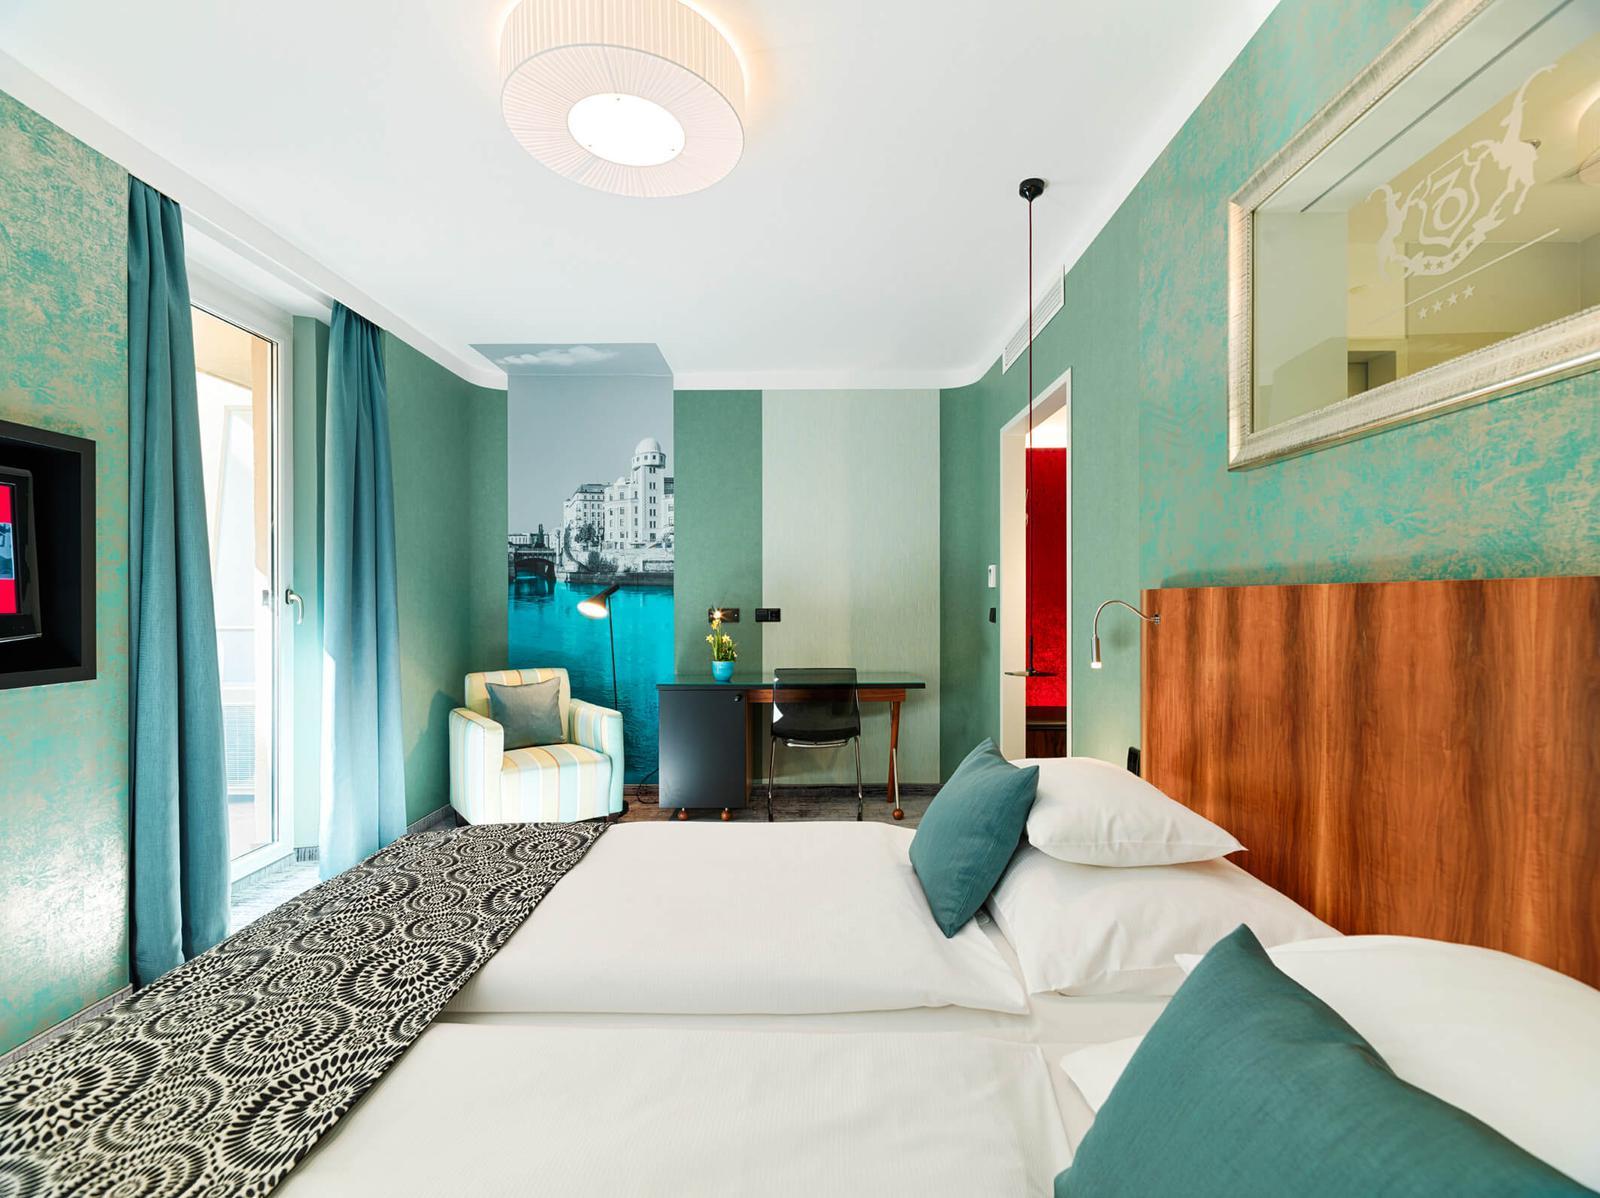 Design hotels of Vienna - Capricorno